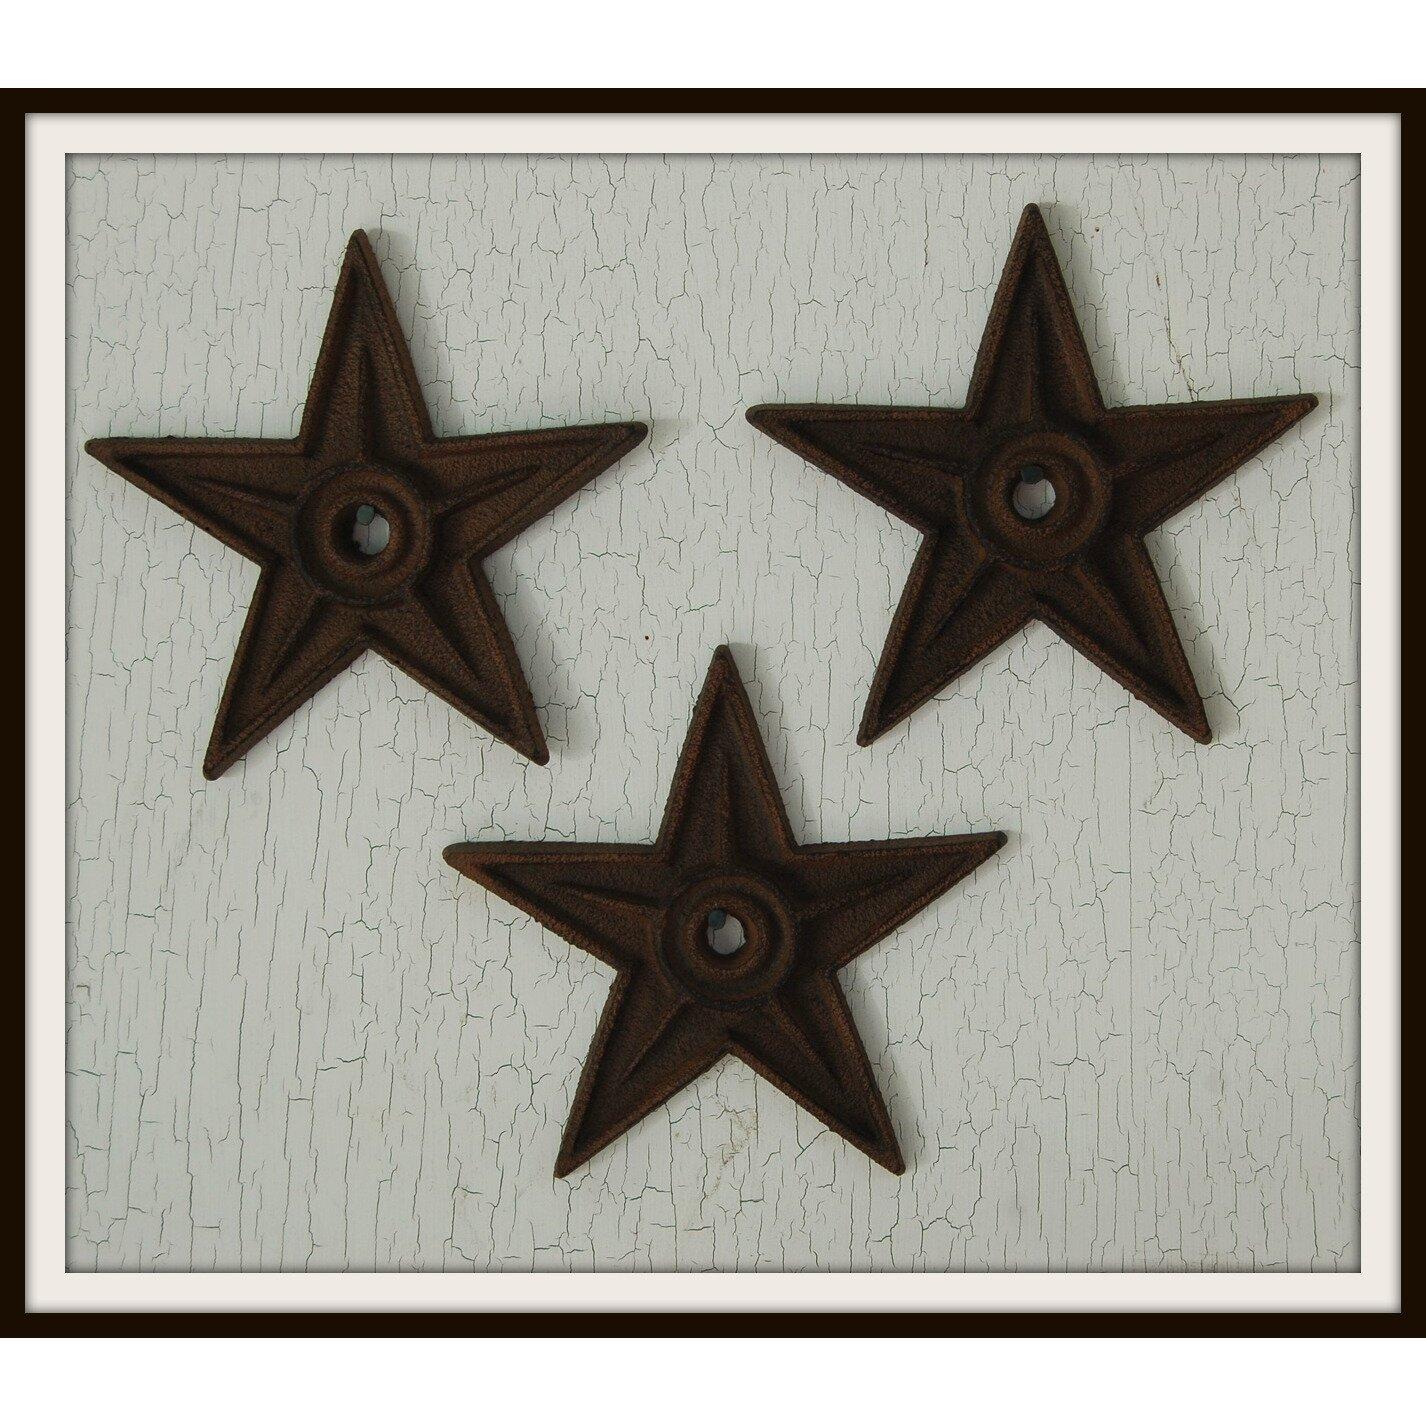 Glass Star Wall Decor : Craft tex small star wall d?cor reviews wayfair